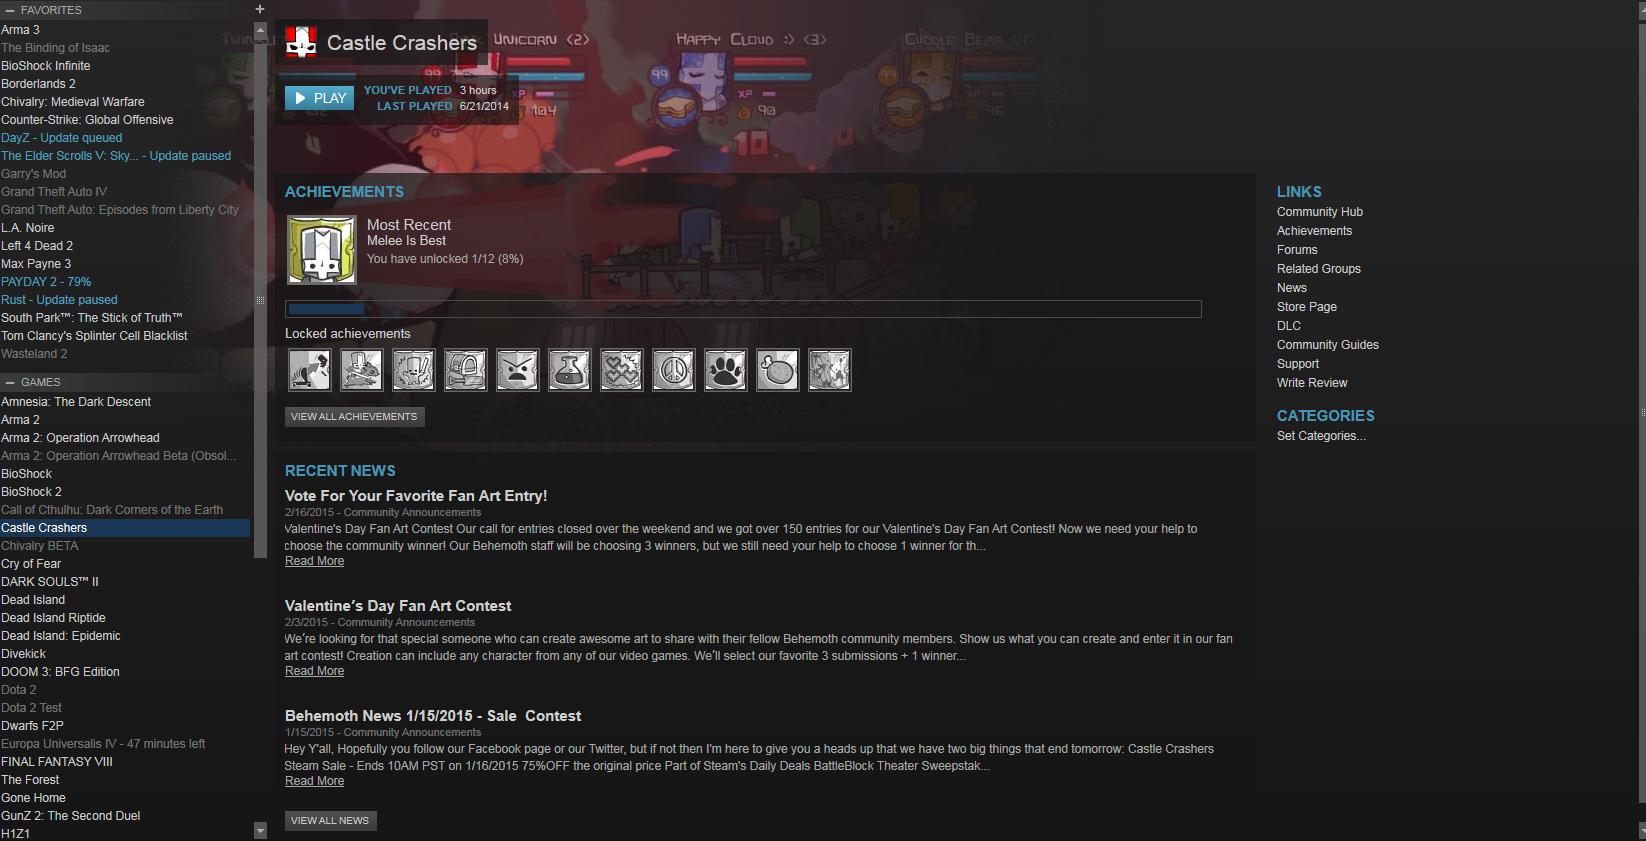 Vac Ban Steam Profile Troll: Steam Account For Sale ARMA 3 RUST HAS ONE VAC BAN ON DAYZ